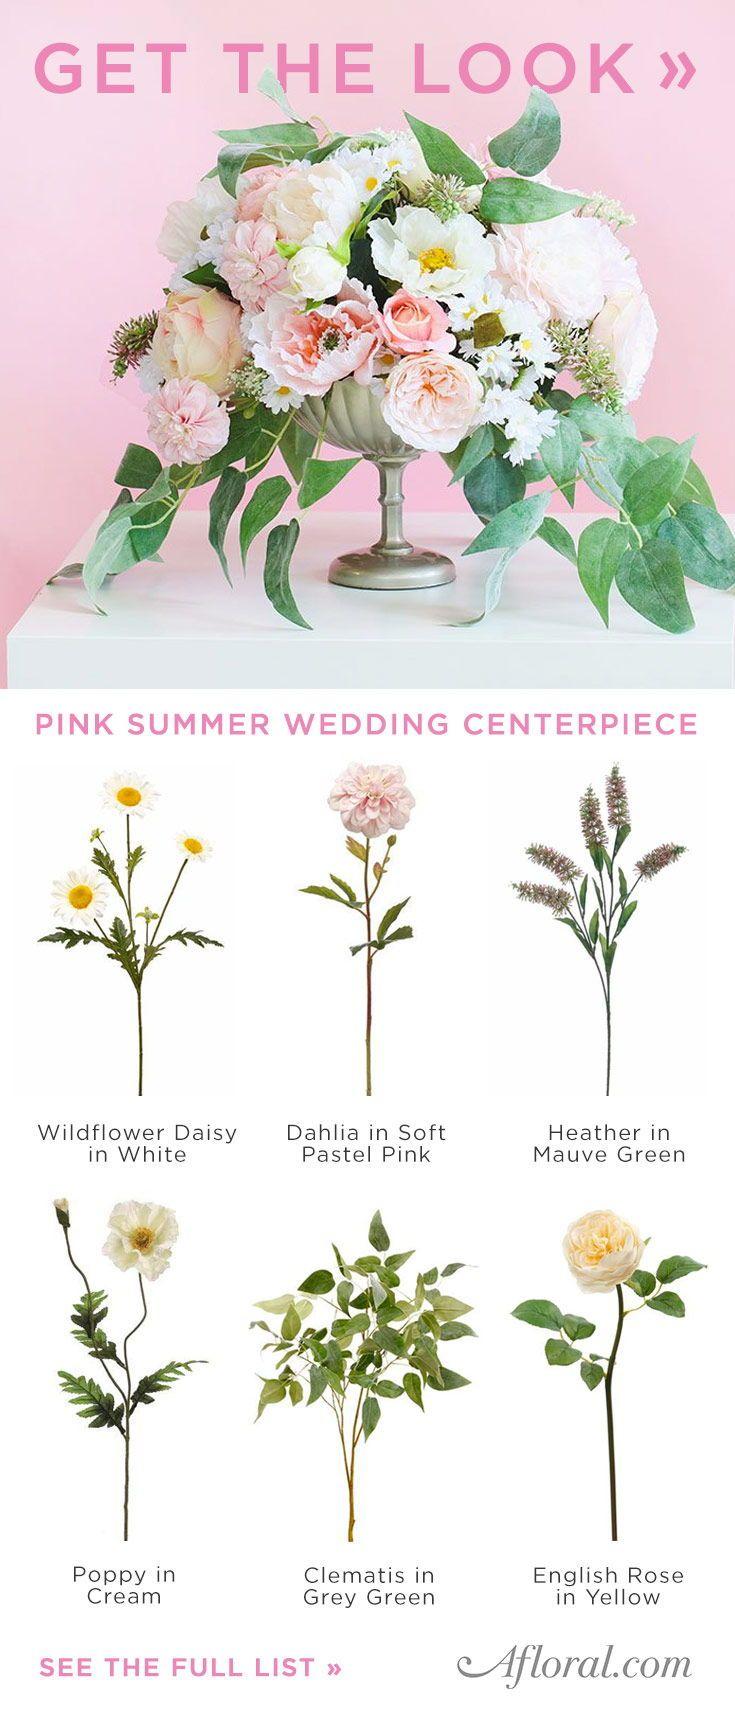 Get The Look: Pink Summer Wedding Centerpiece | Summer wedding ...